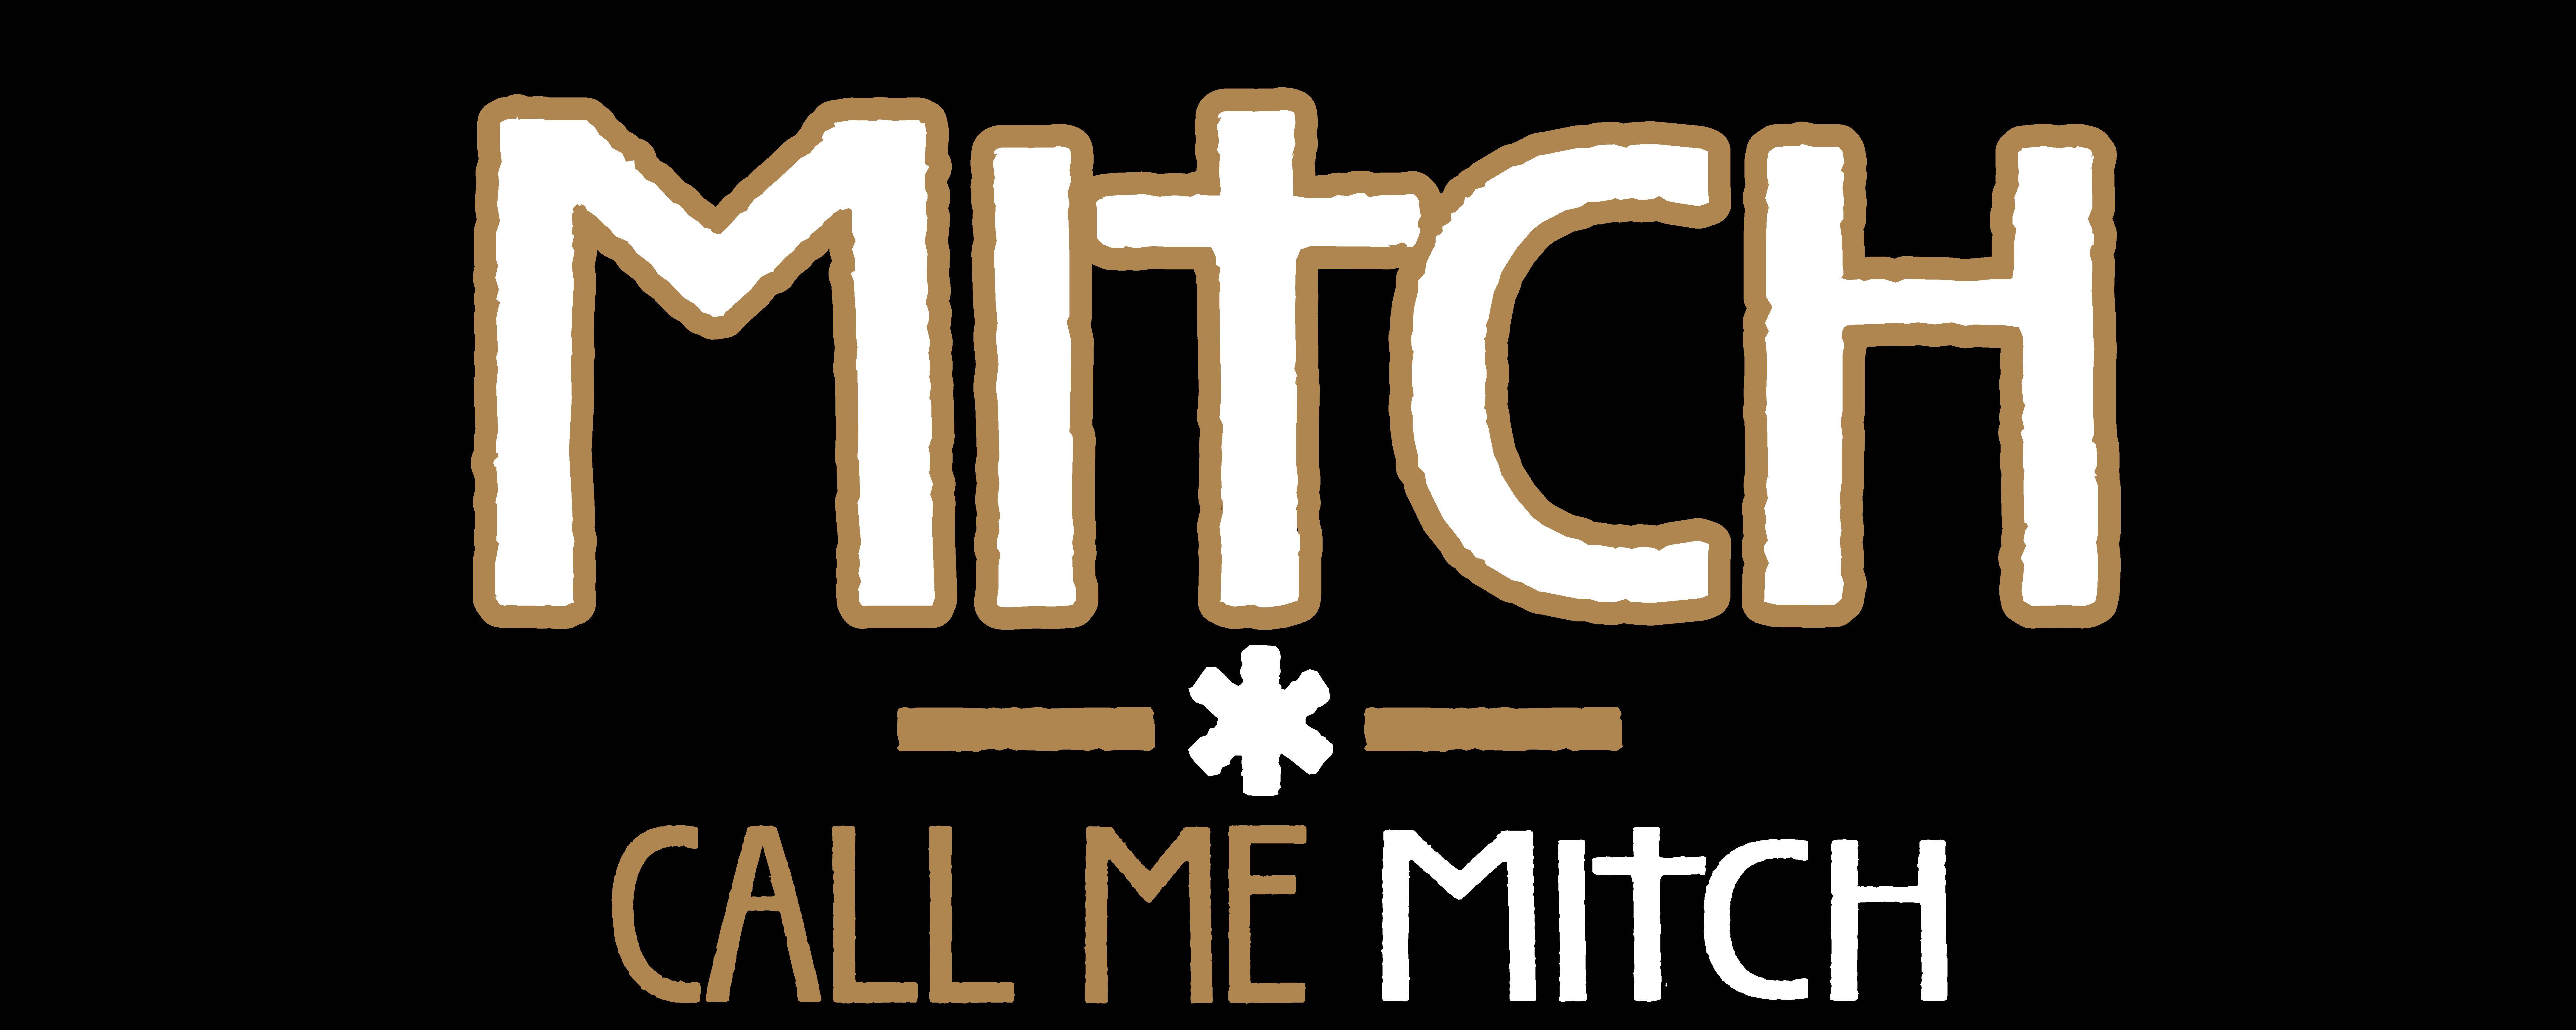 Call Me Mitch